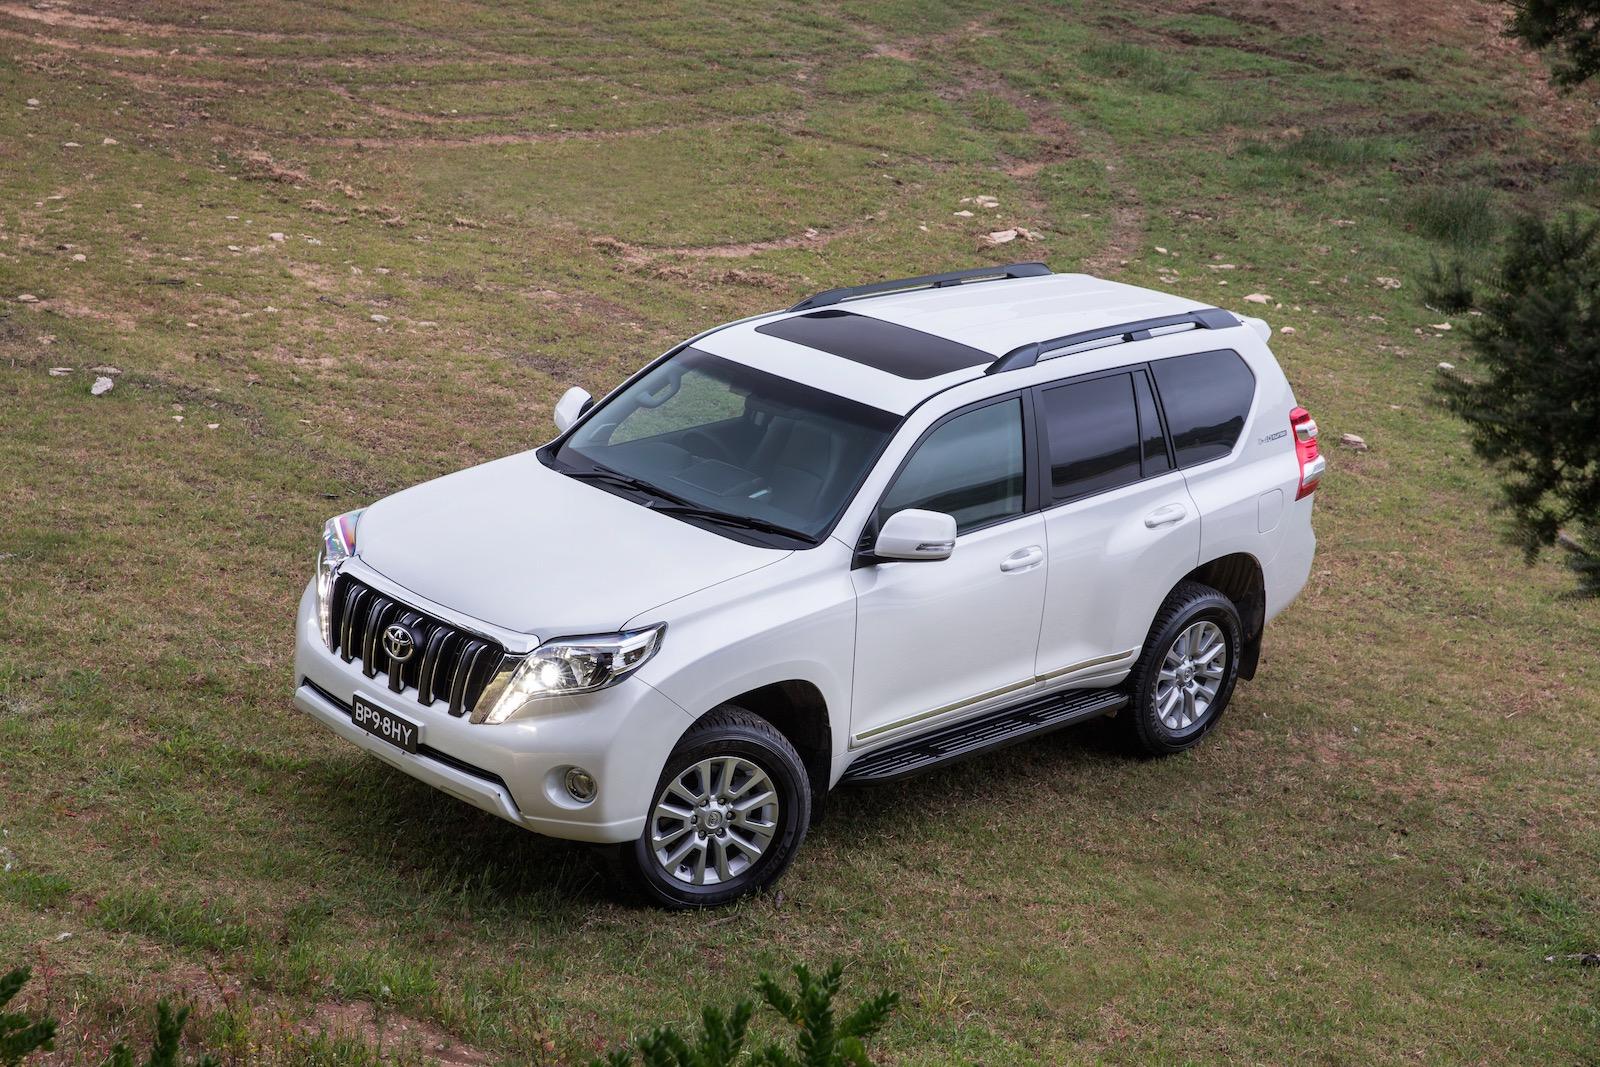 Suv For Sale Under 5000 >> 2017 Toyota Prado Altitude special edition on sale in Australia | PerformanceDrive